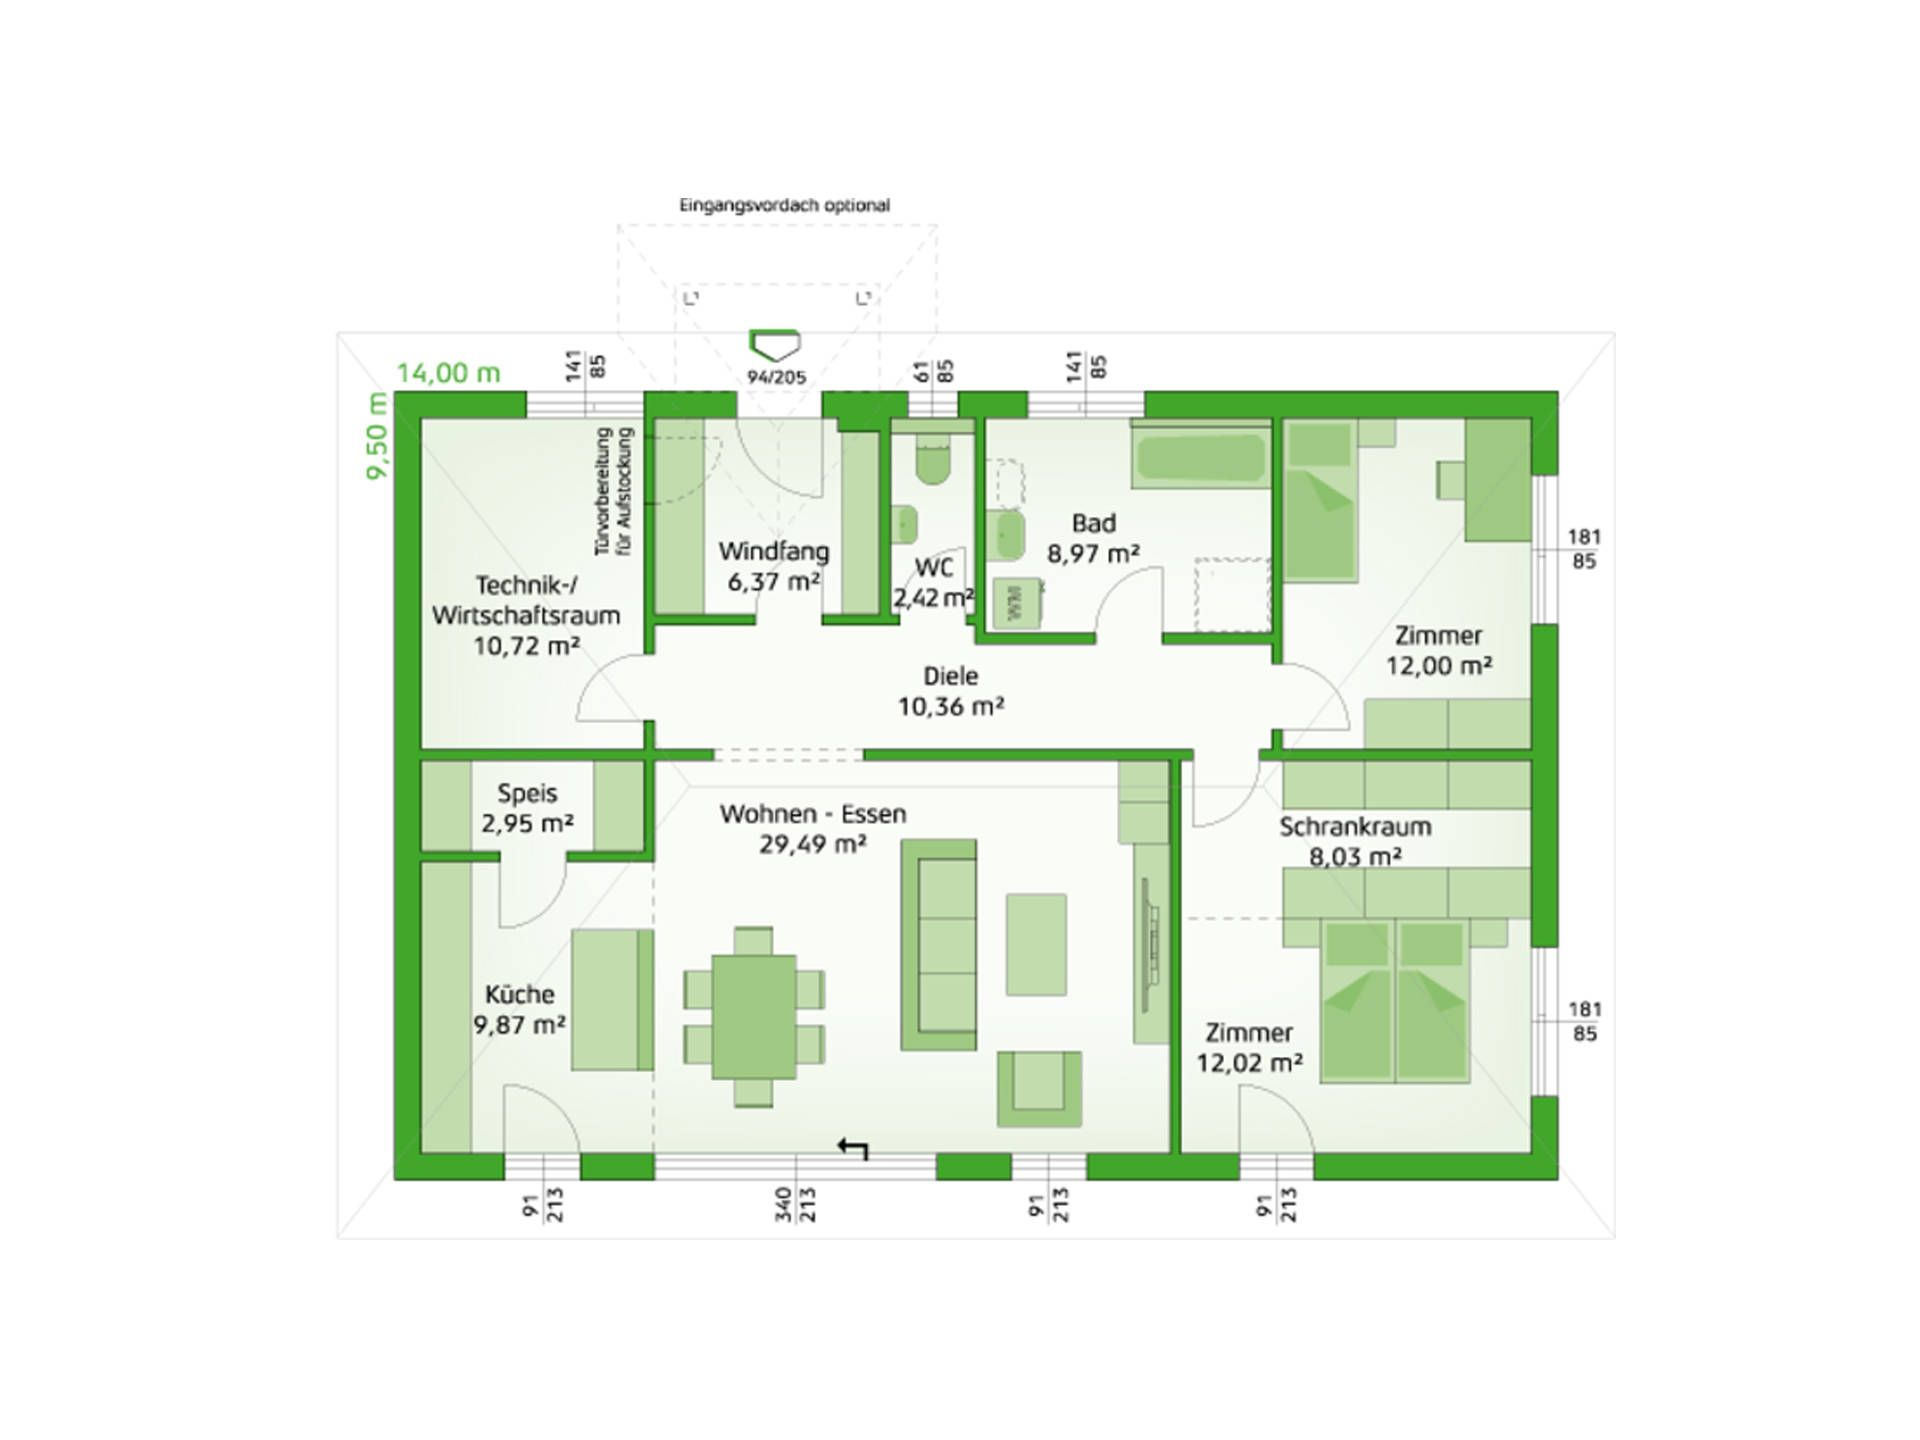 Musterhaus grundriss bungalow  HARTL Haus Bungalow Comfort 113 W Grundriss EG | ⭐Bungalow ...